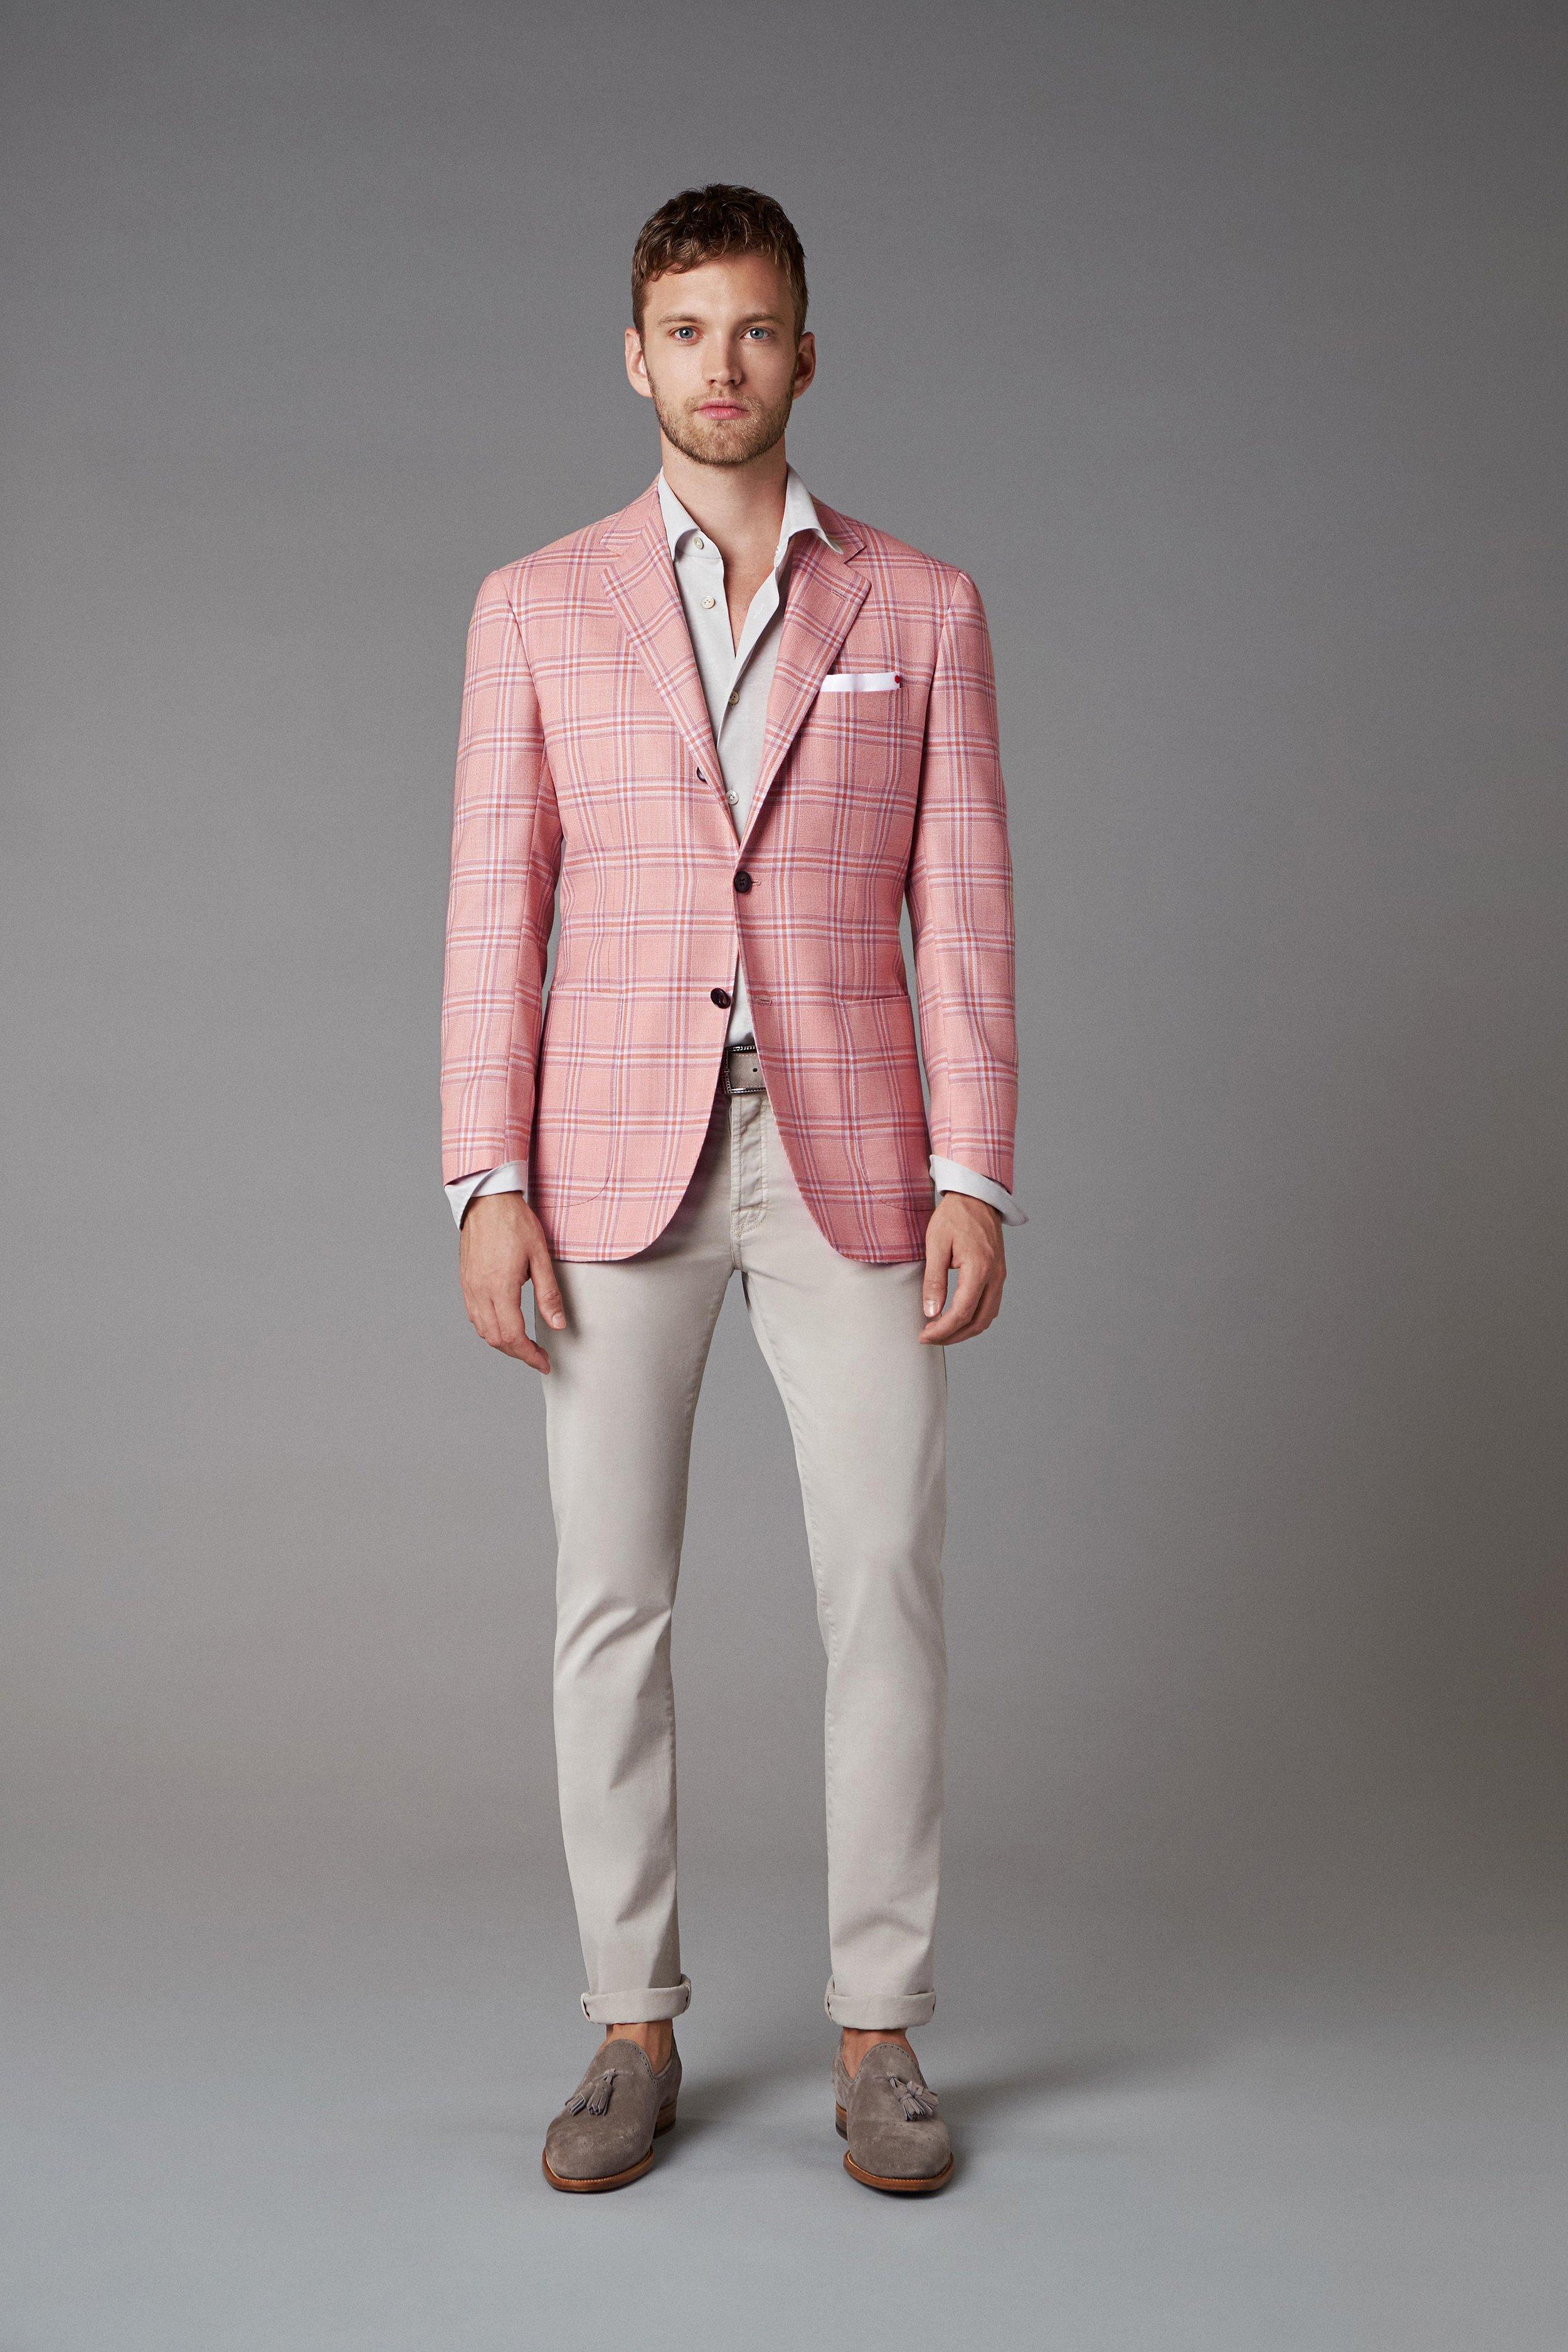 00007-Kiton-Vogue-Menswear-SS19-pr.jpg